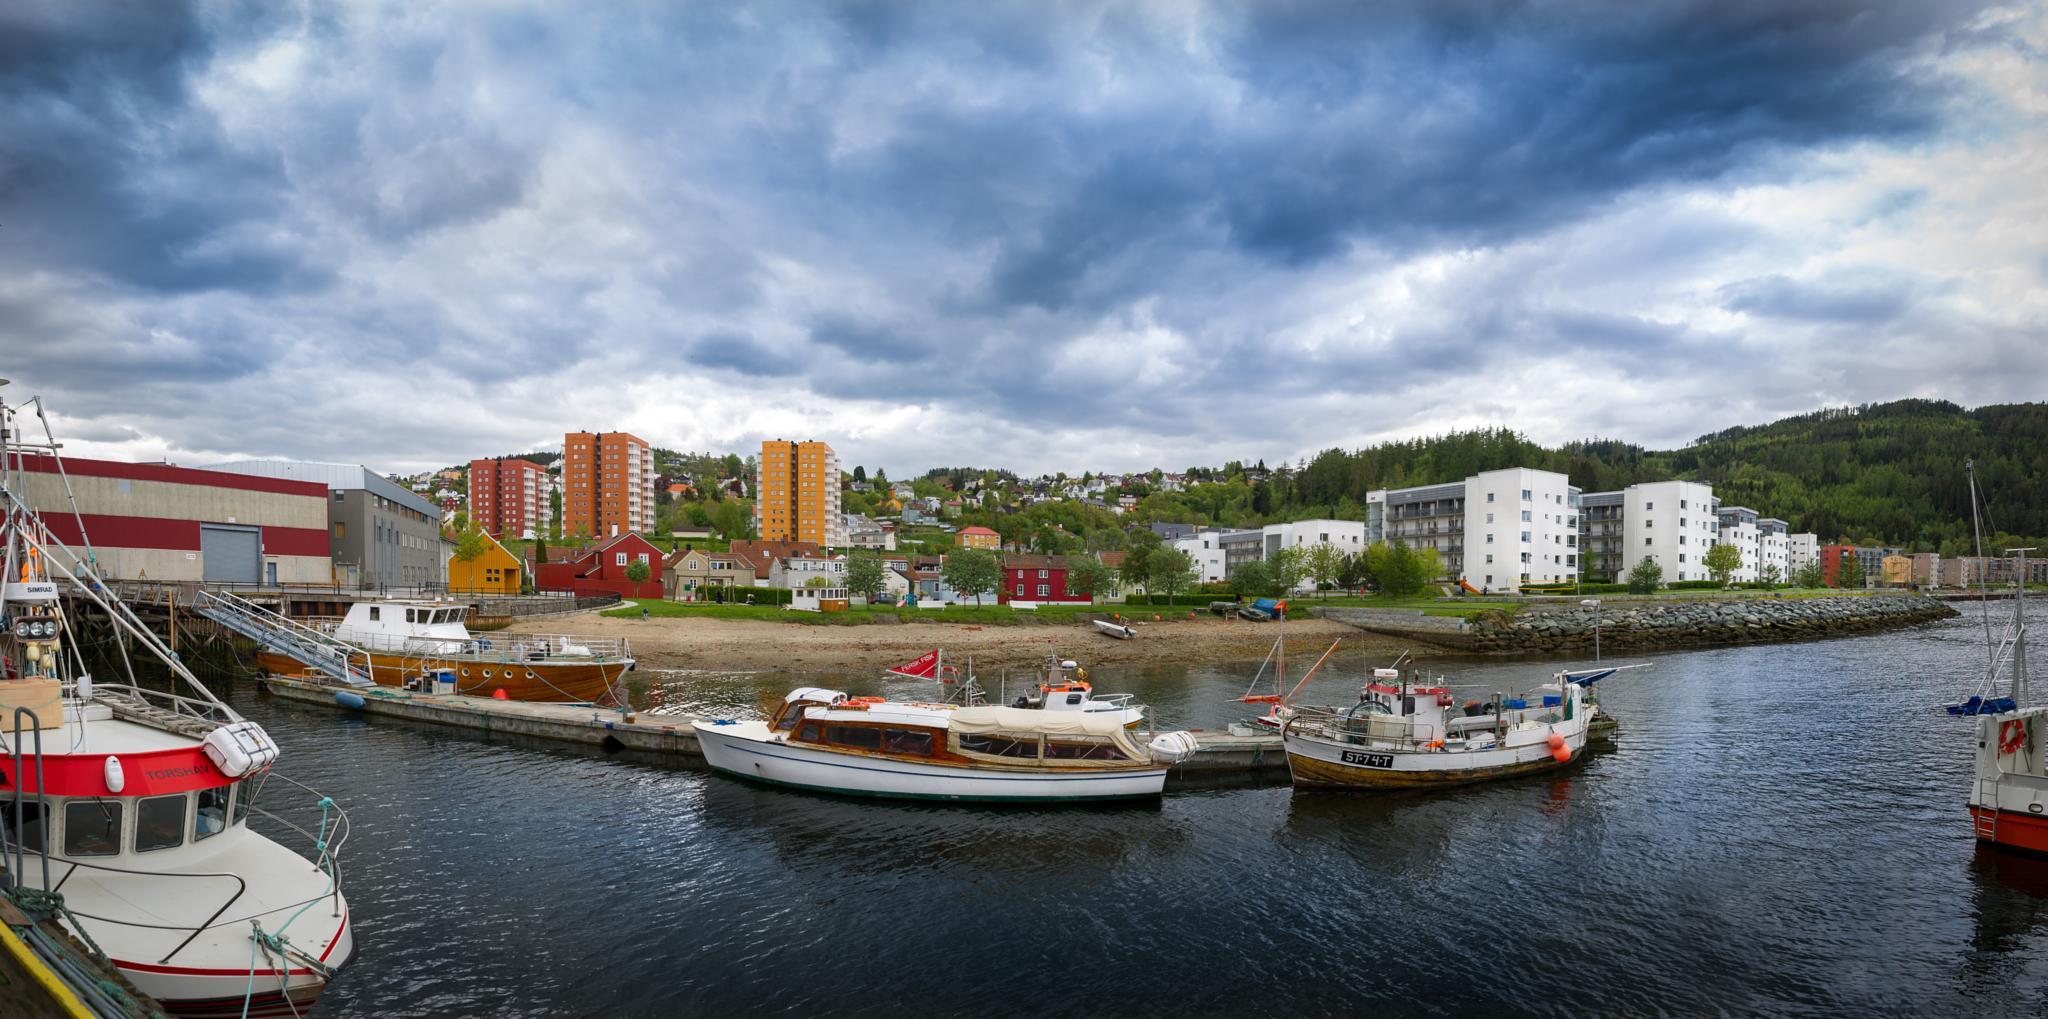 Ila, Trondheim by robertmagnussen